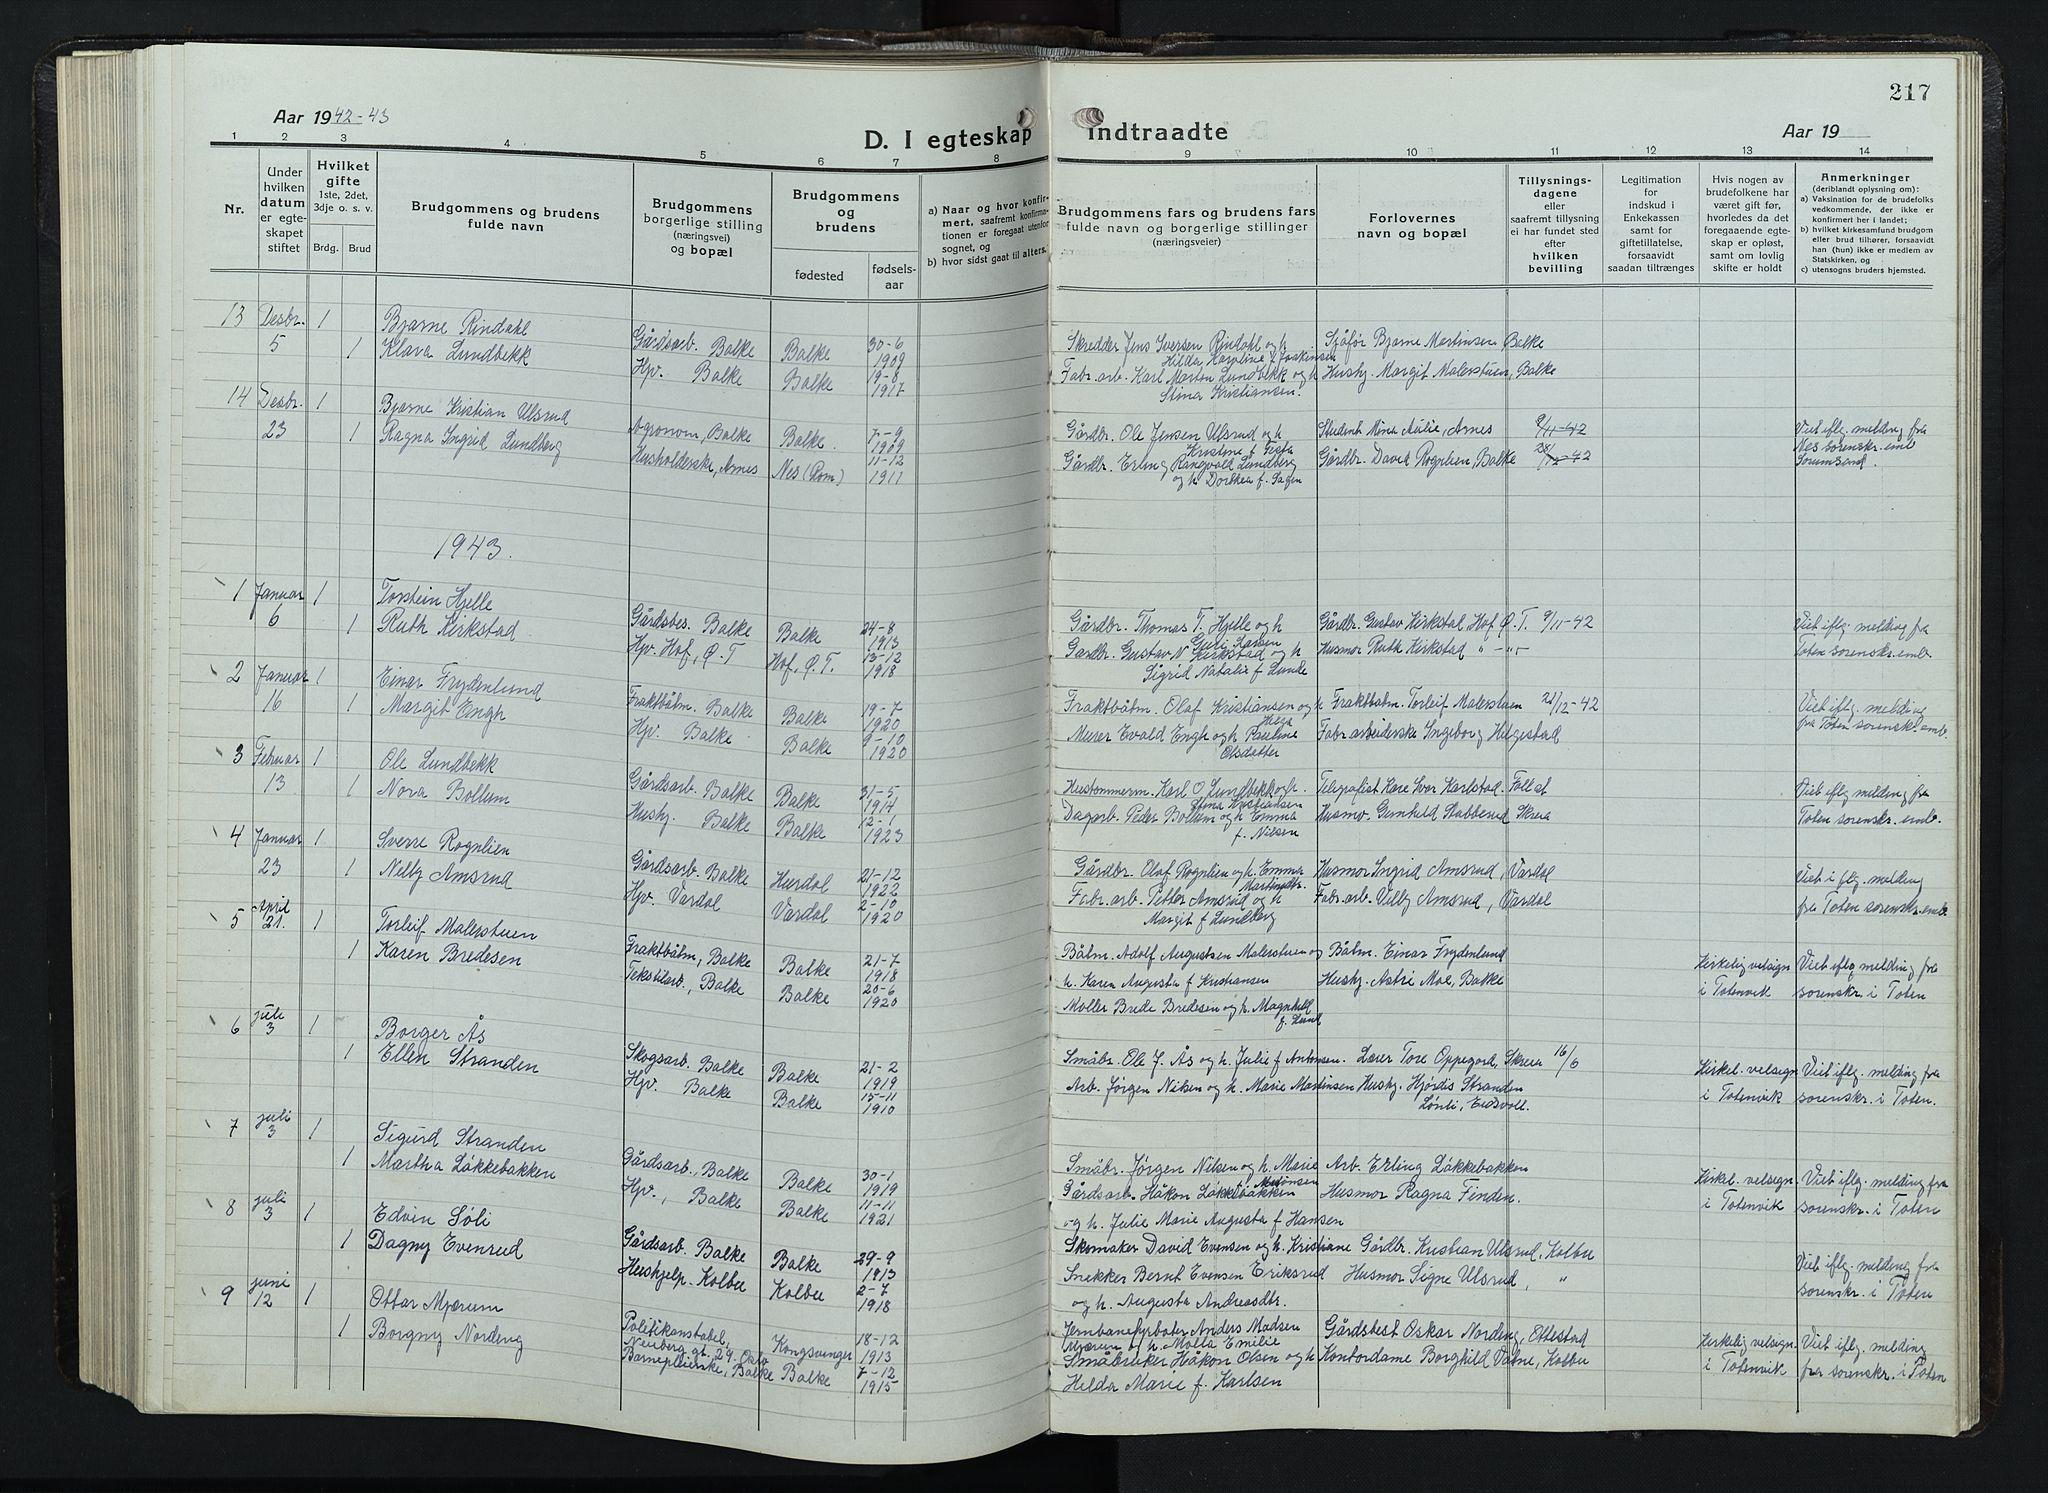 SAH, Balke prestekontor, Klokkerbok nr. 1, 1920-1955, s. 217